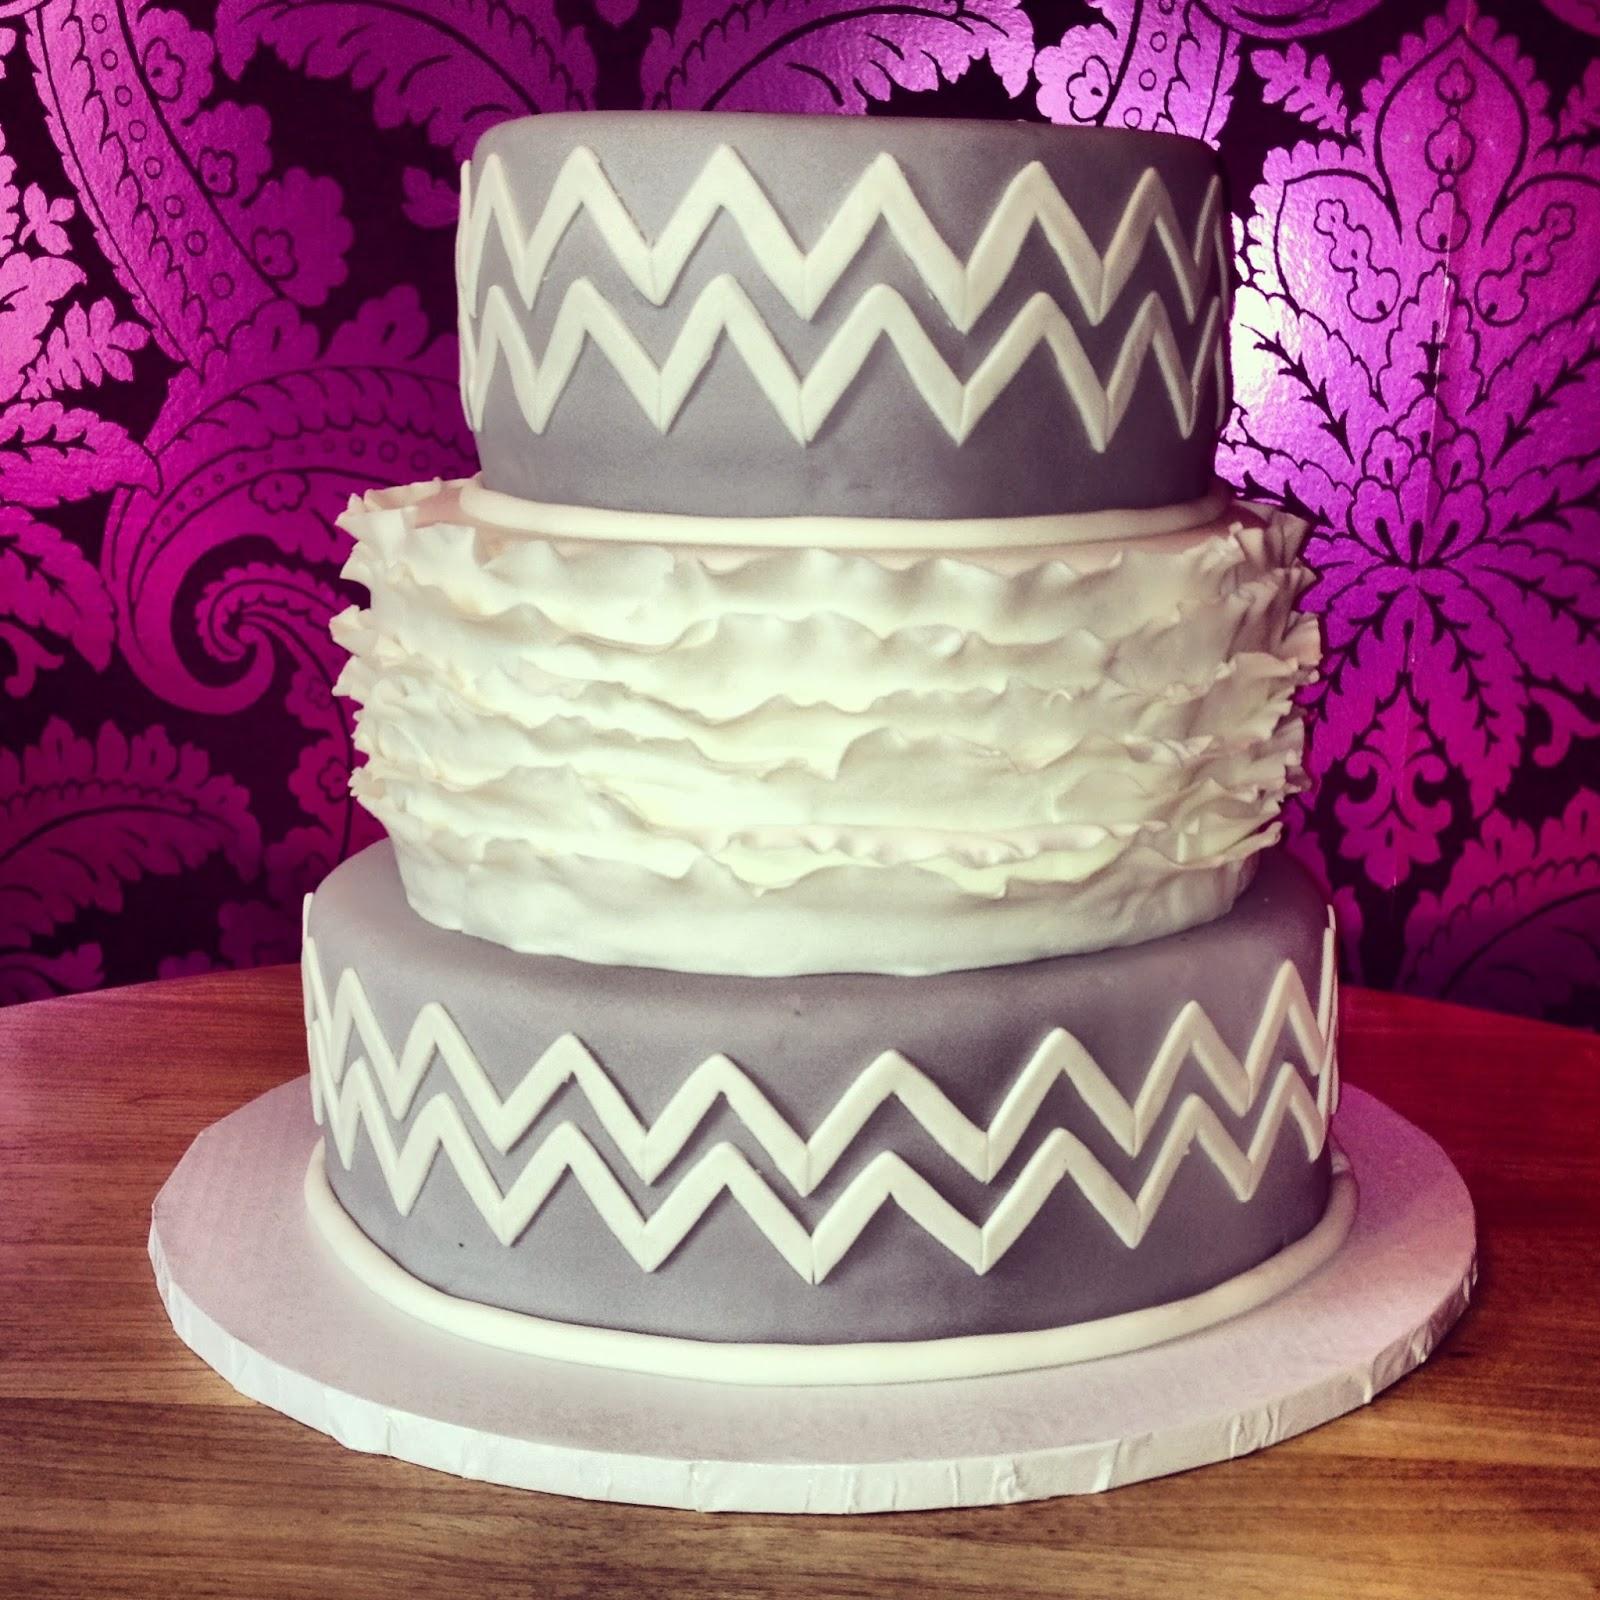 Budget Friendly Wedding Cake Solutions | Partyspace Philadelphia